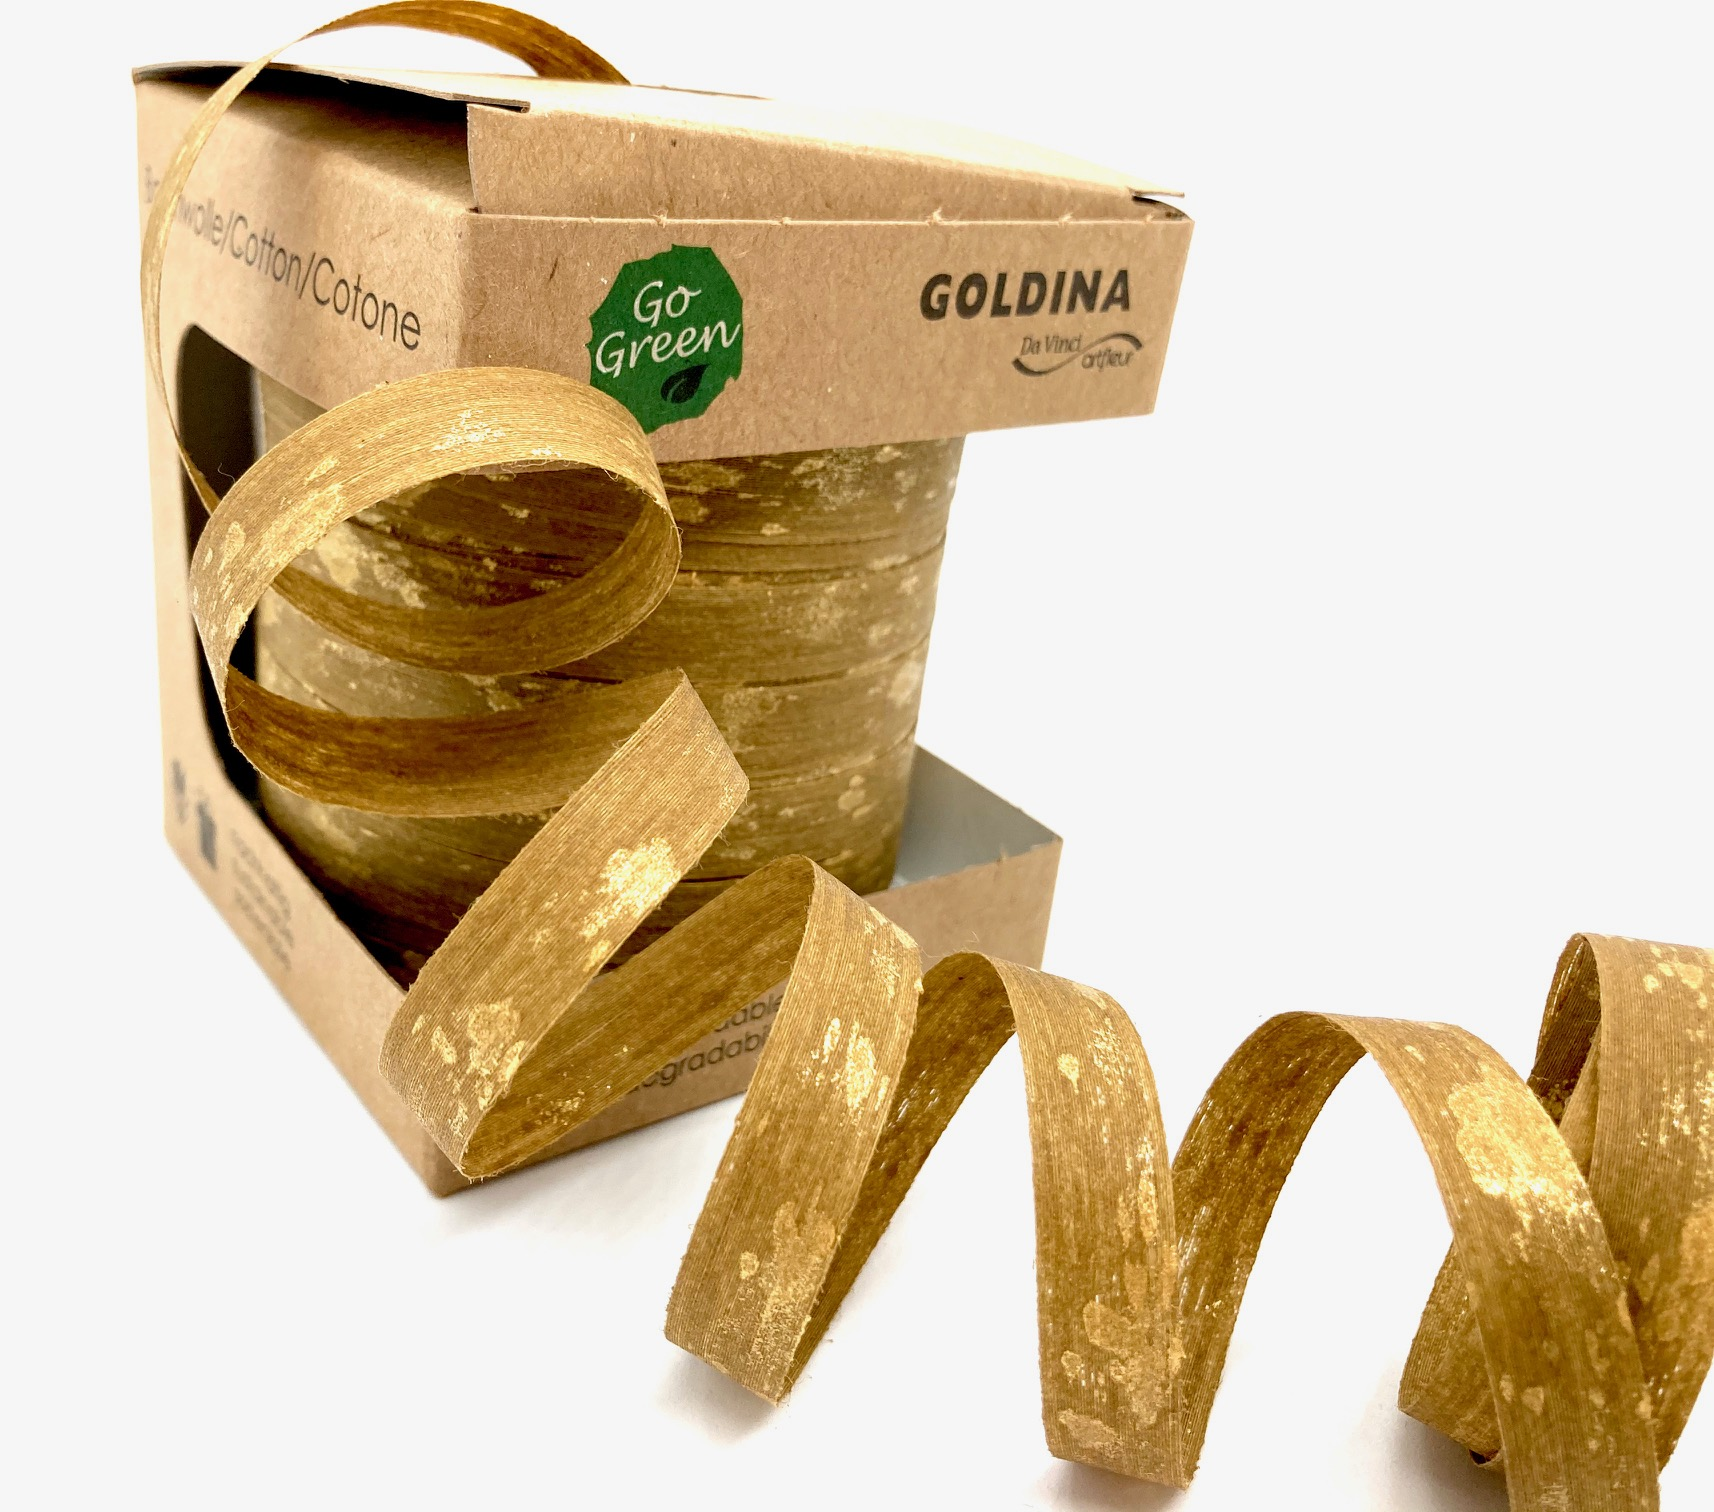 Ringelband Gold, 100 Meter, 100% Baumwolle